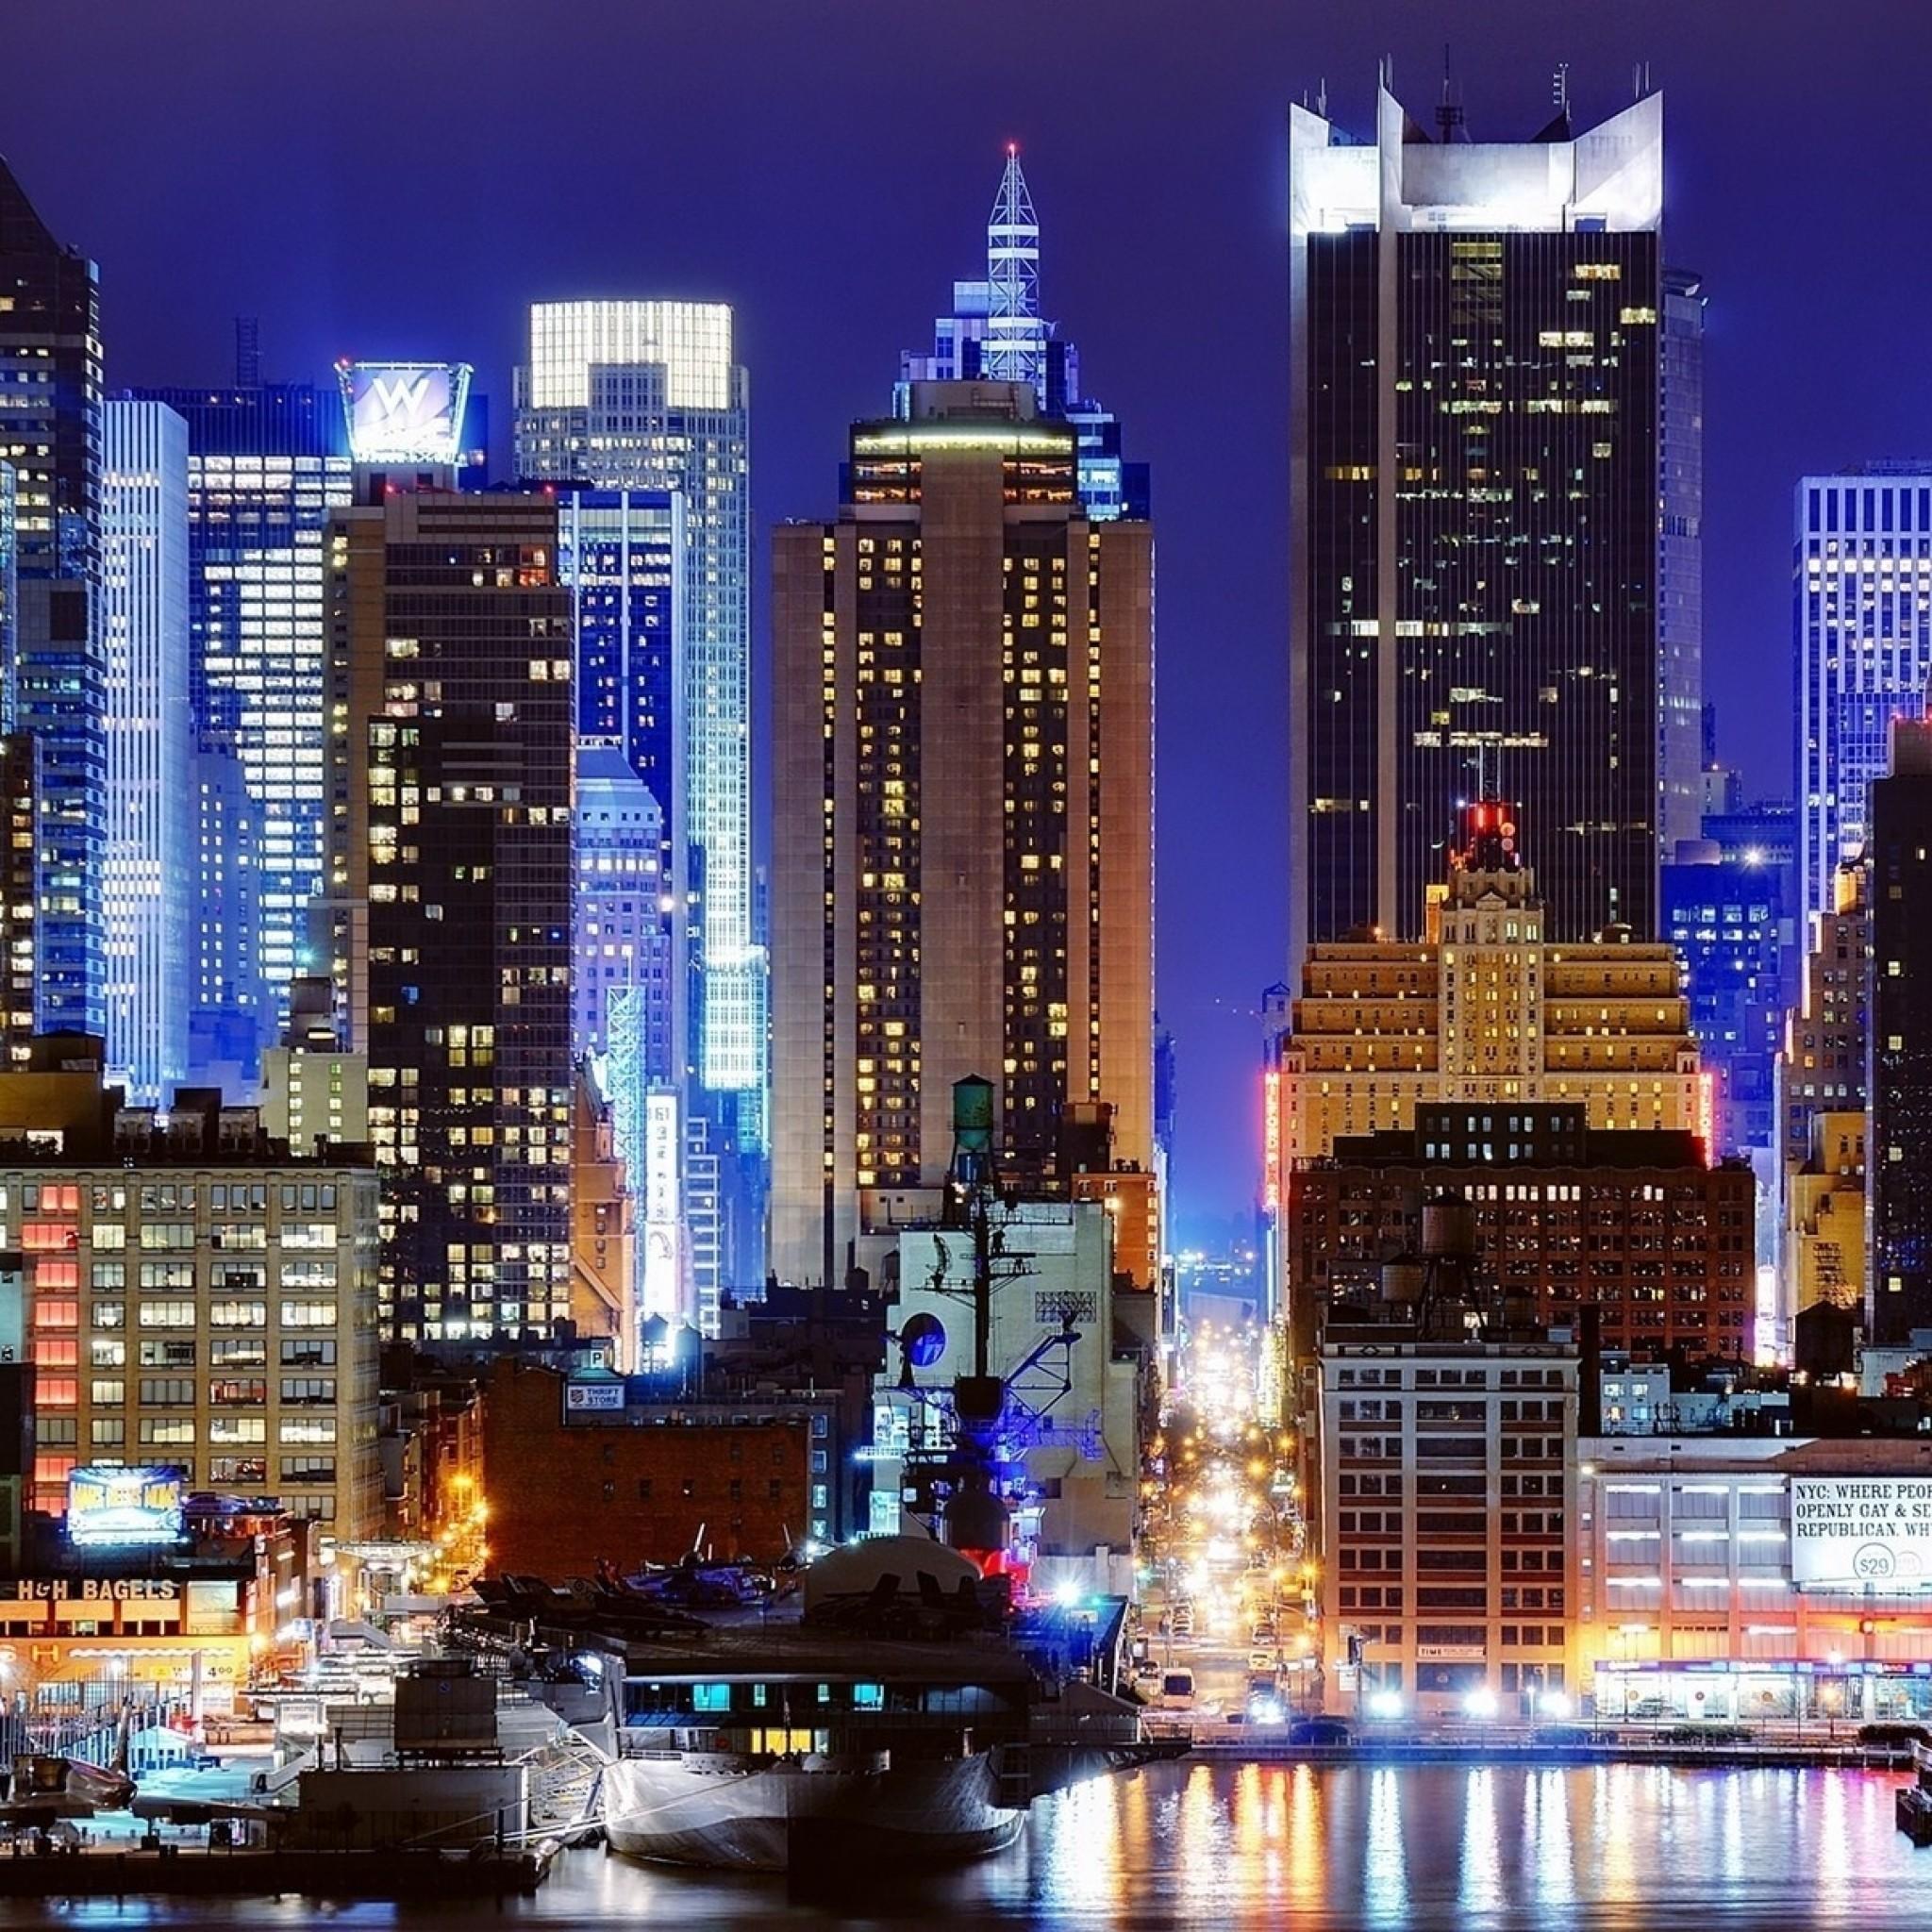 New York At Night Wallpaper (67+ Images